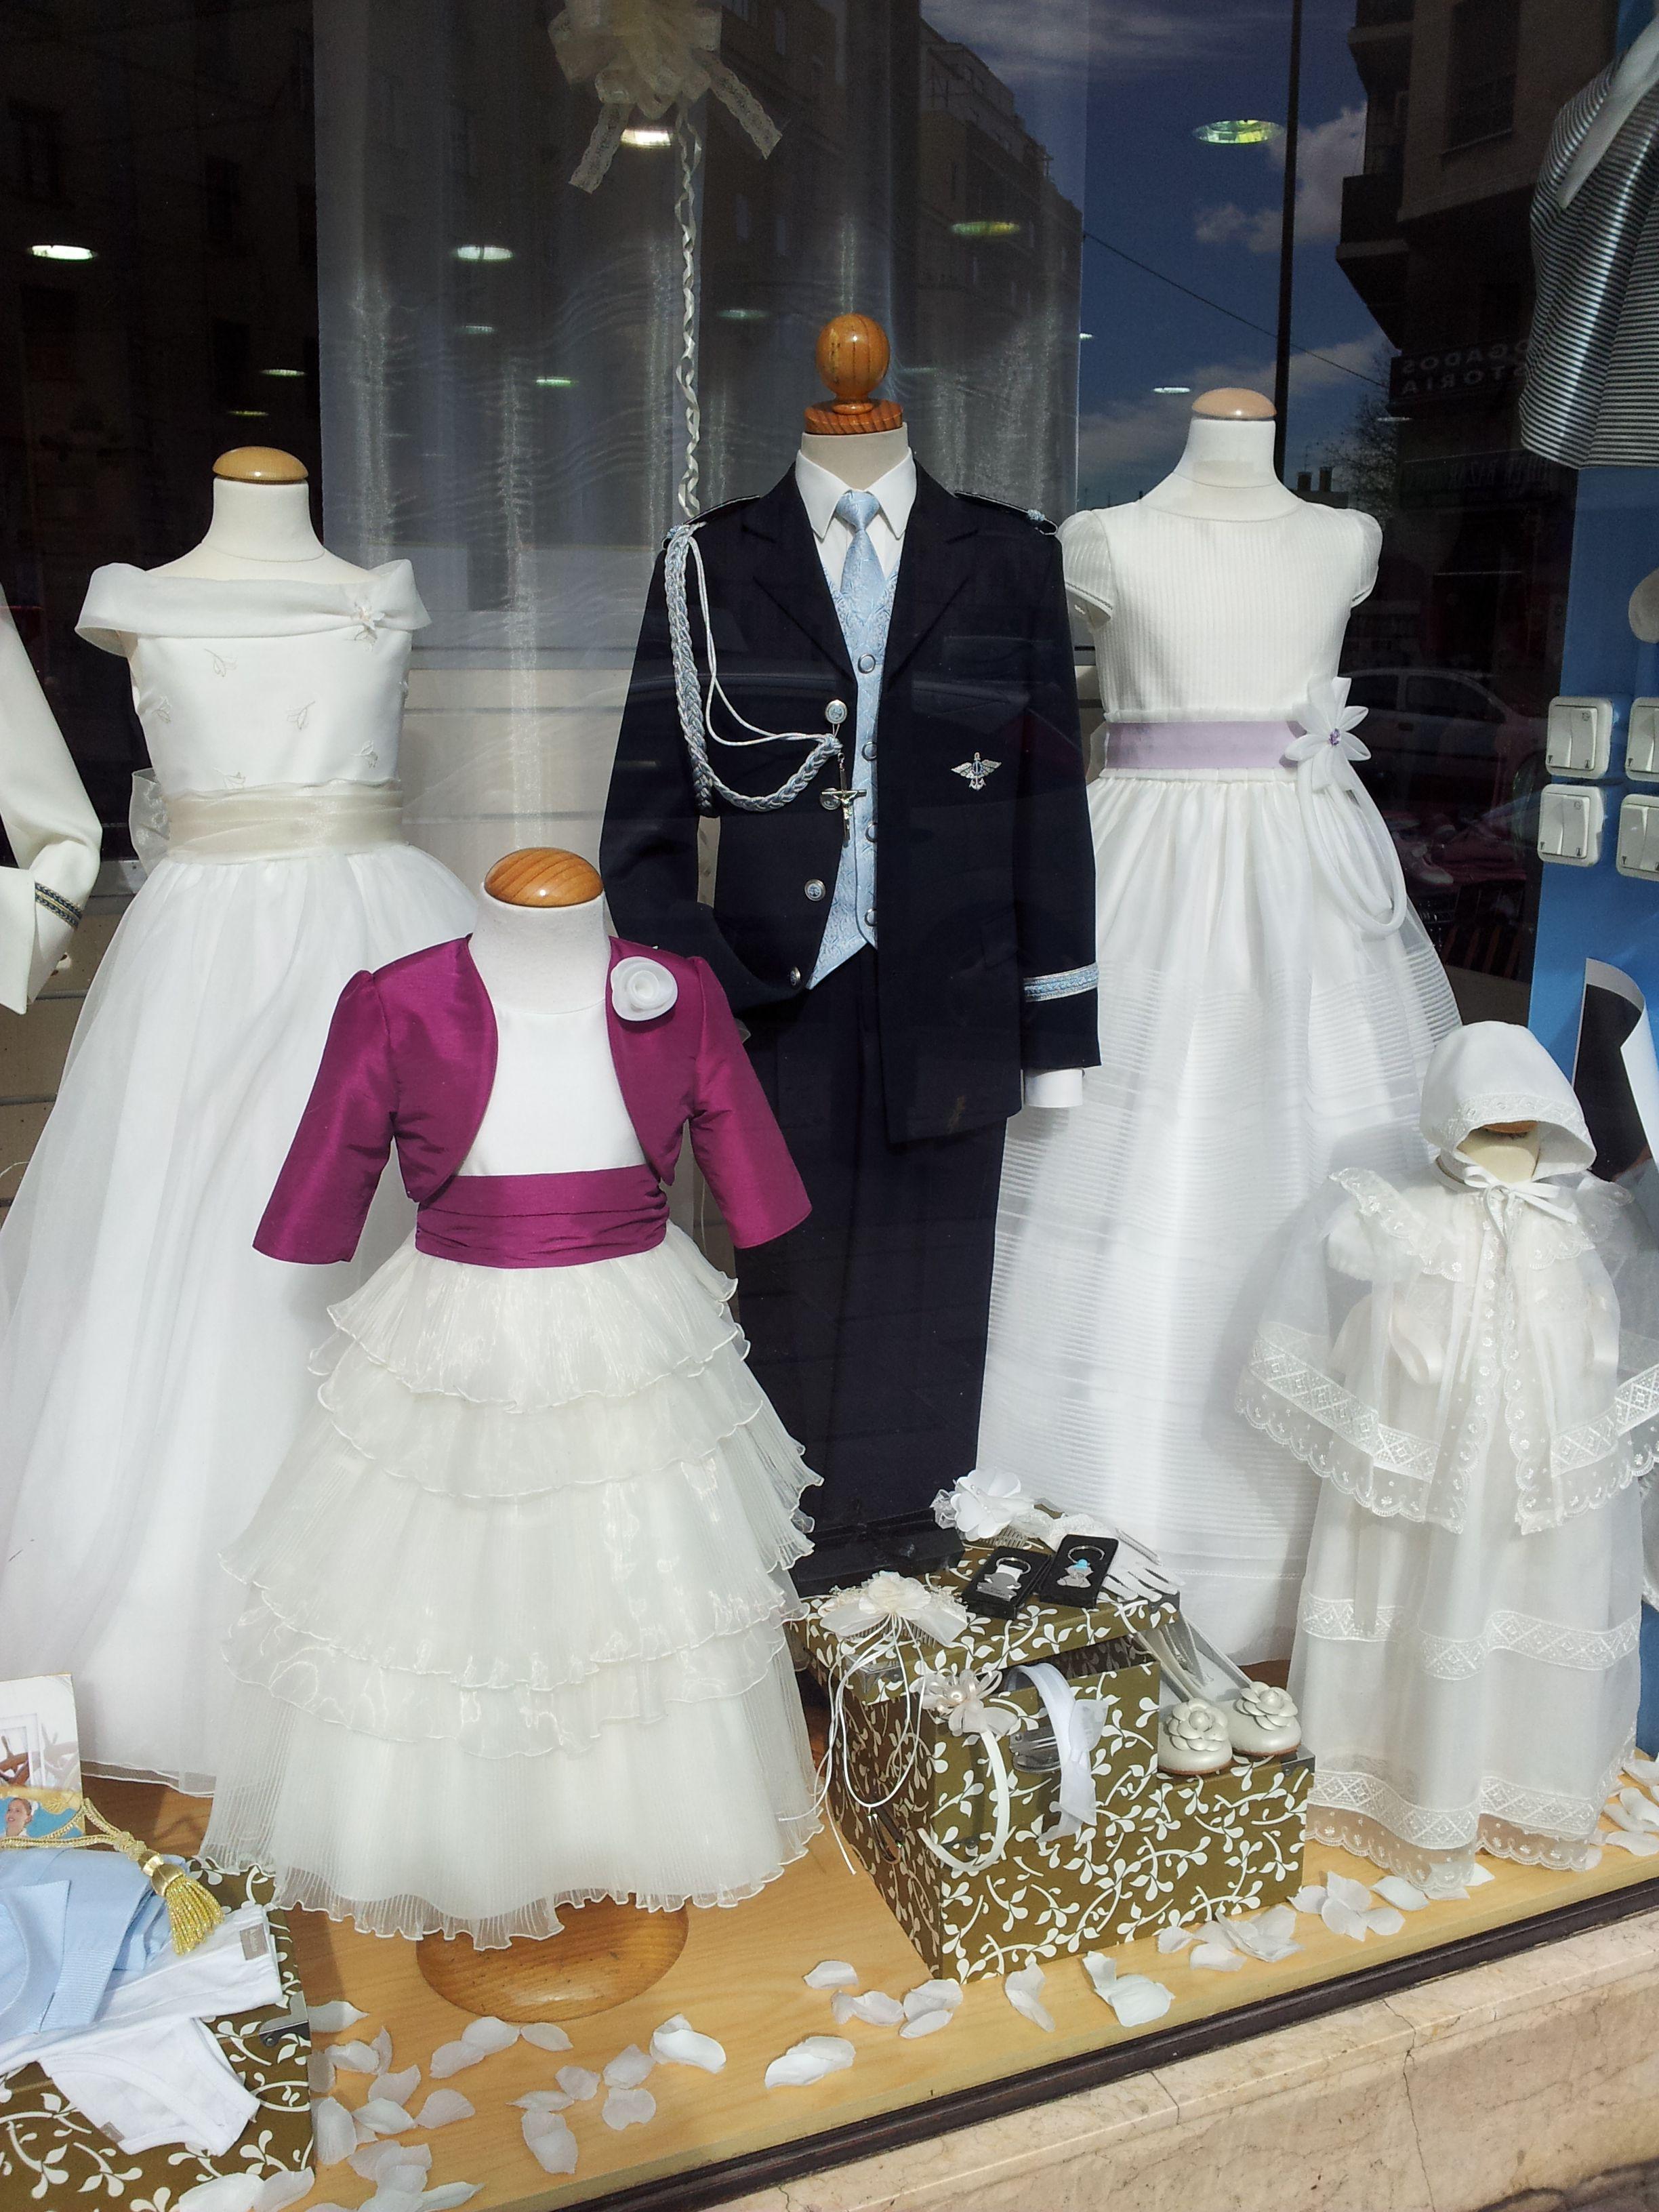 e6c3d38f0f Donde comprar ropa de primera comunión online en USA